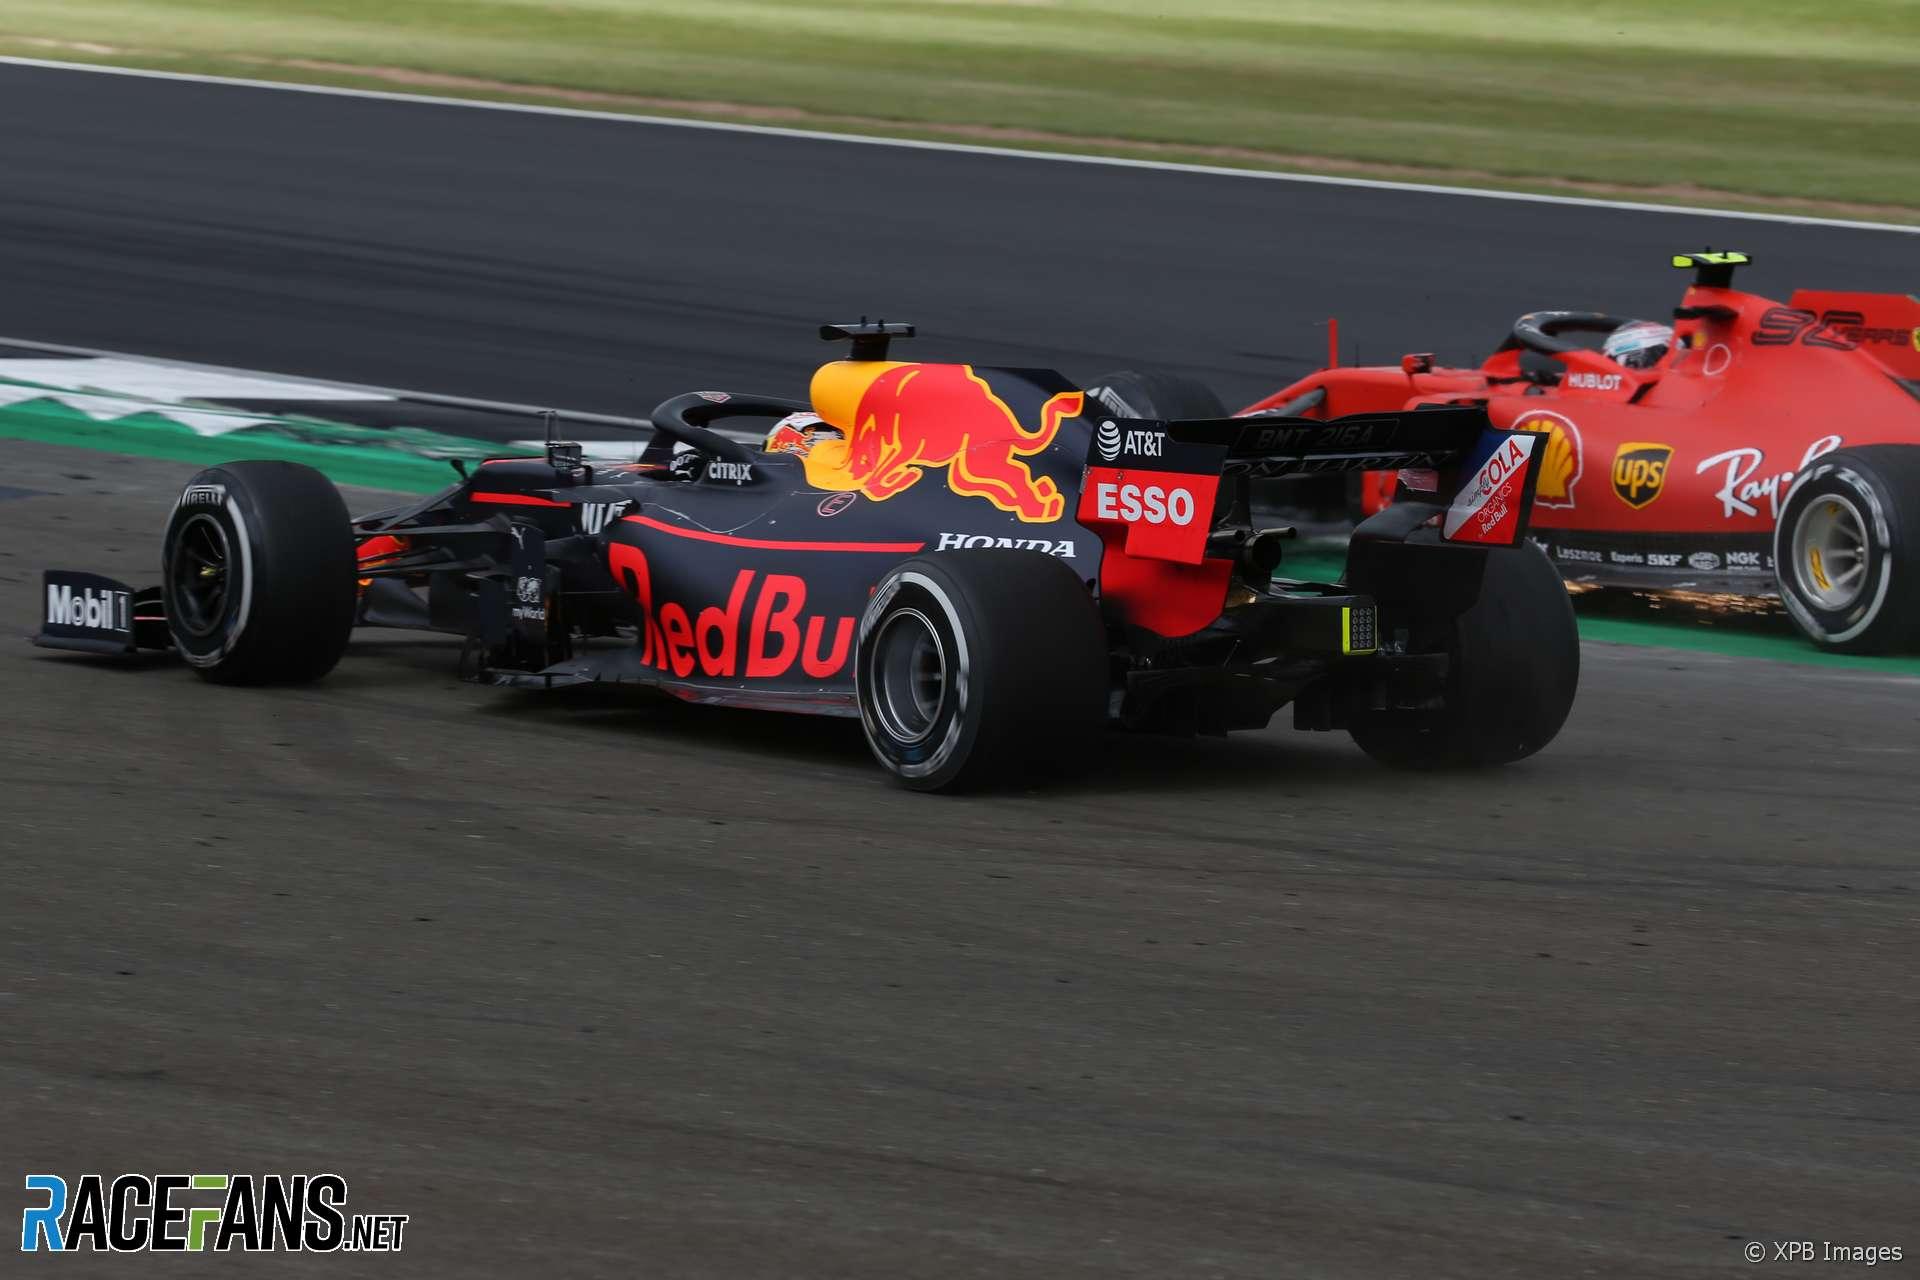 Charles Leclerc, Max Verstappen, Silverstone, 2019